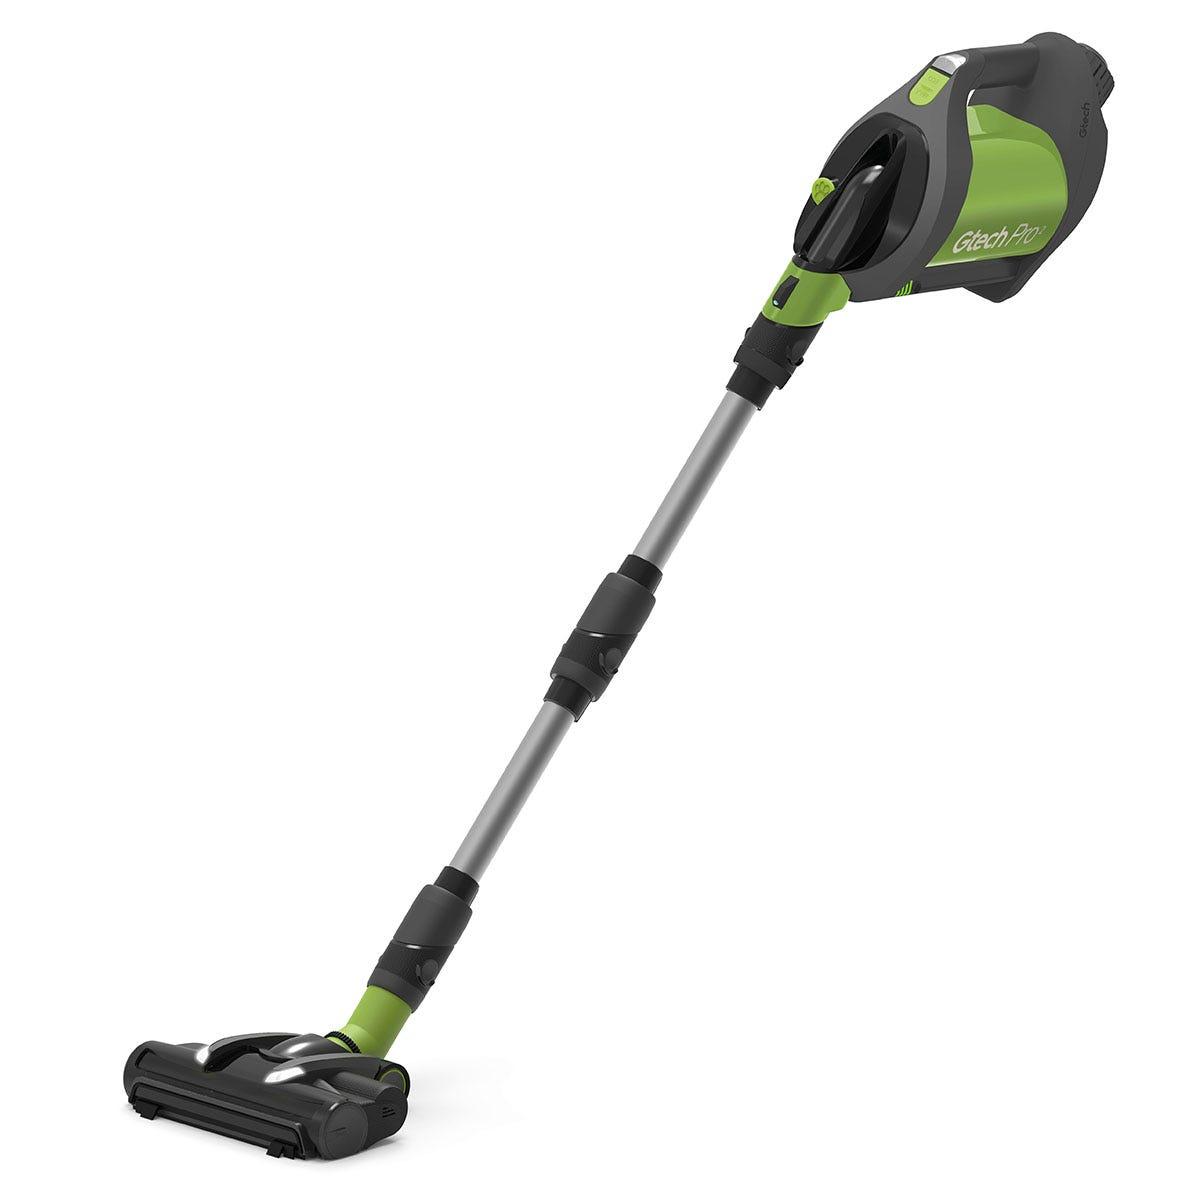 Gtech 1-03-225 Pro 2 Vacuum Cleaner - Green & Black